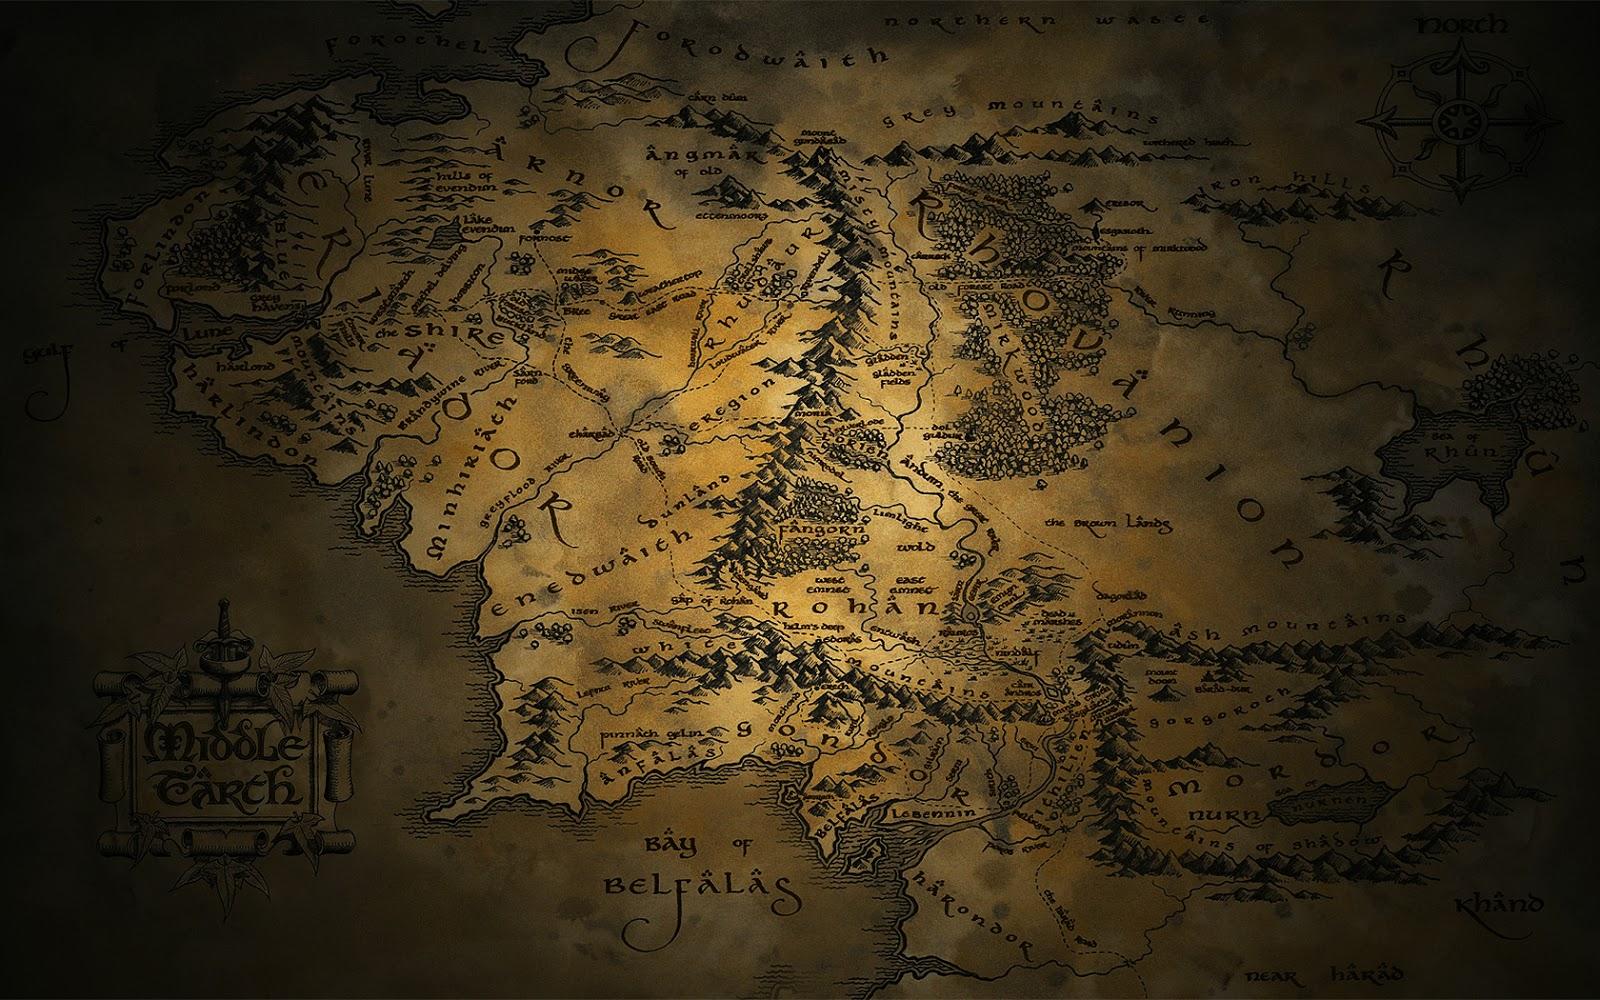 Hd Wallpapers Desktop Lord Of The Rings Desktop Wallpapers